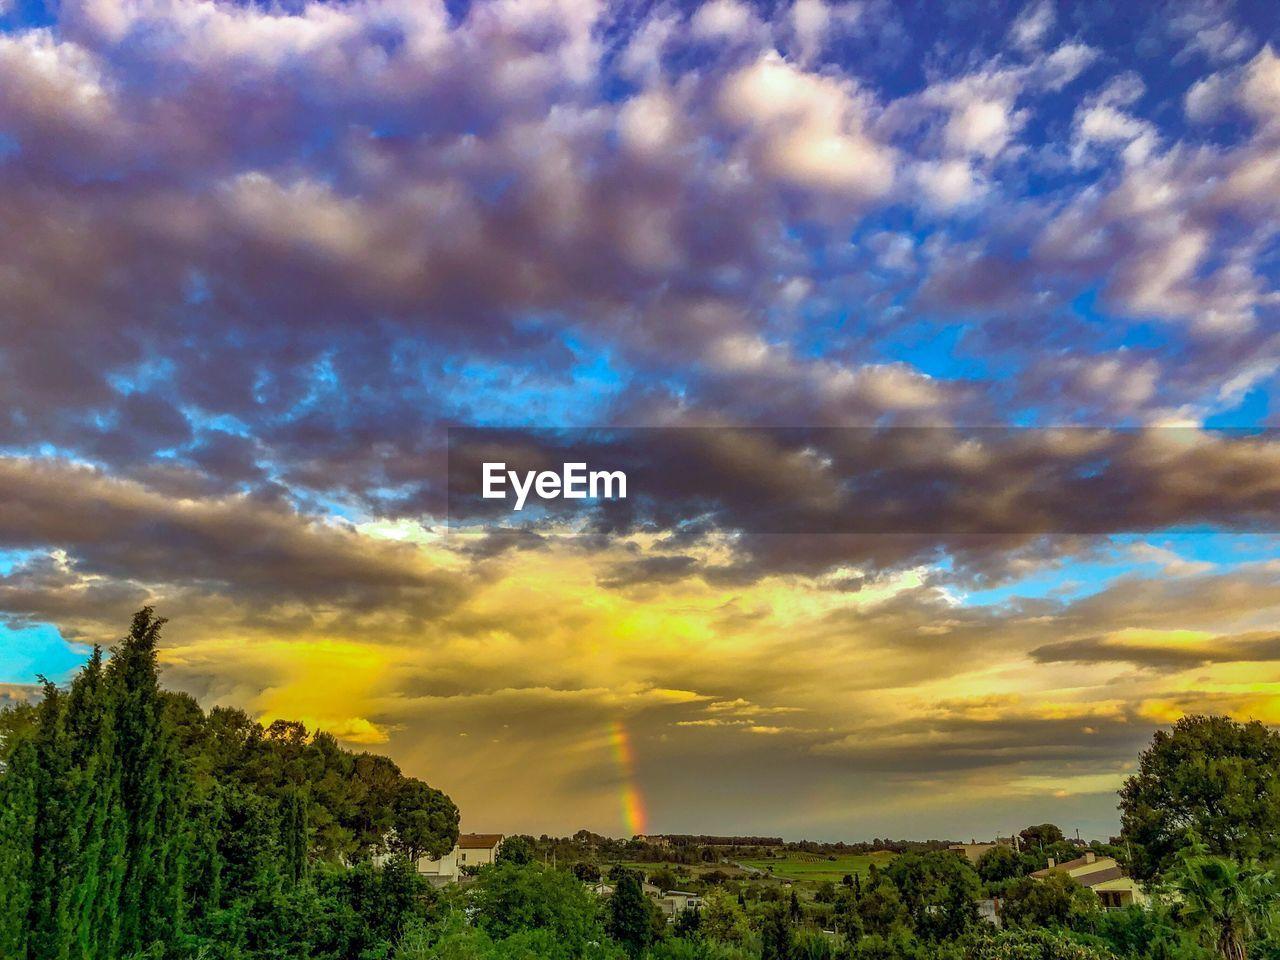 cloud - sky, sky, beauty in nature, plant, scenics - nature, tree, nature, tranquility, tranquil scene, no people, non-urban scene, sunset, outdoors, environment, idyllic, land, rock, rock - object, landscape